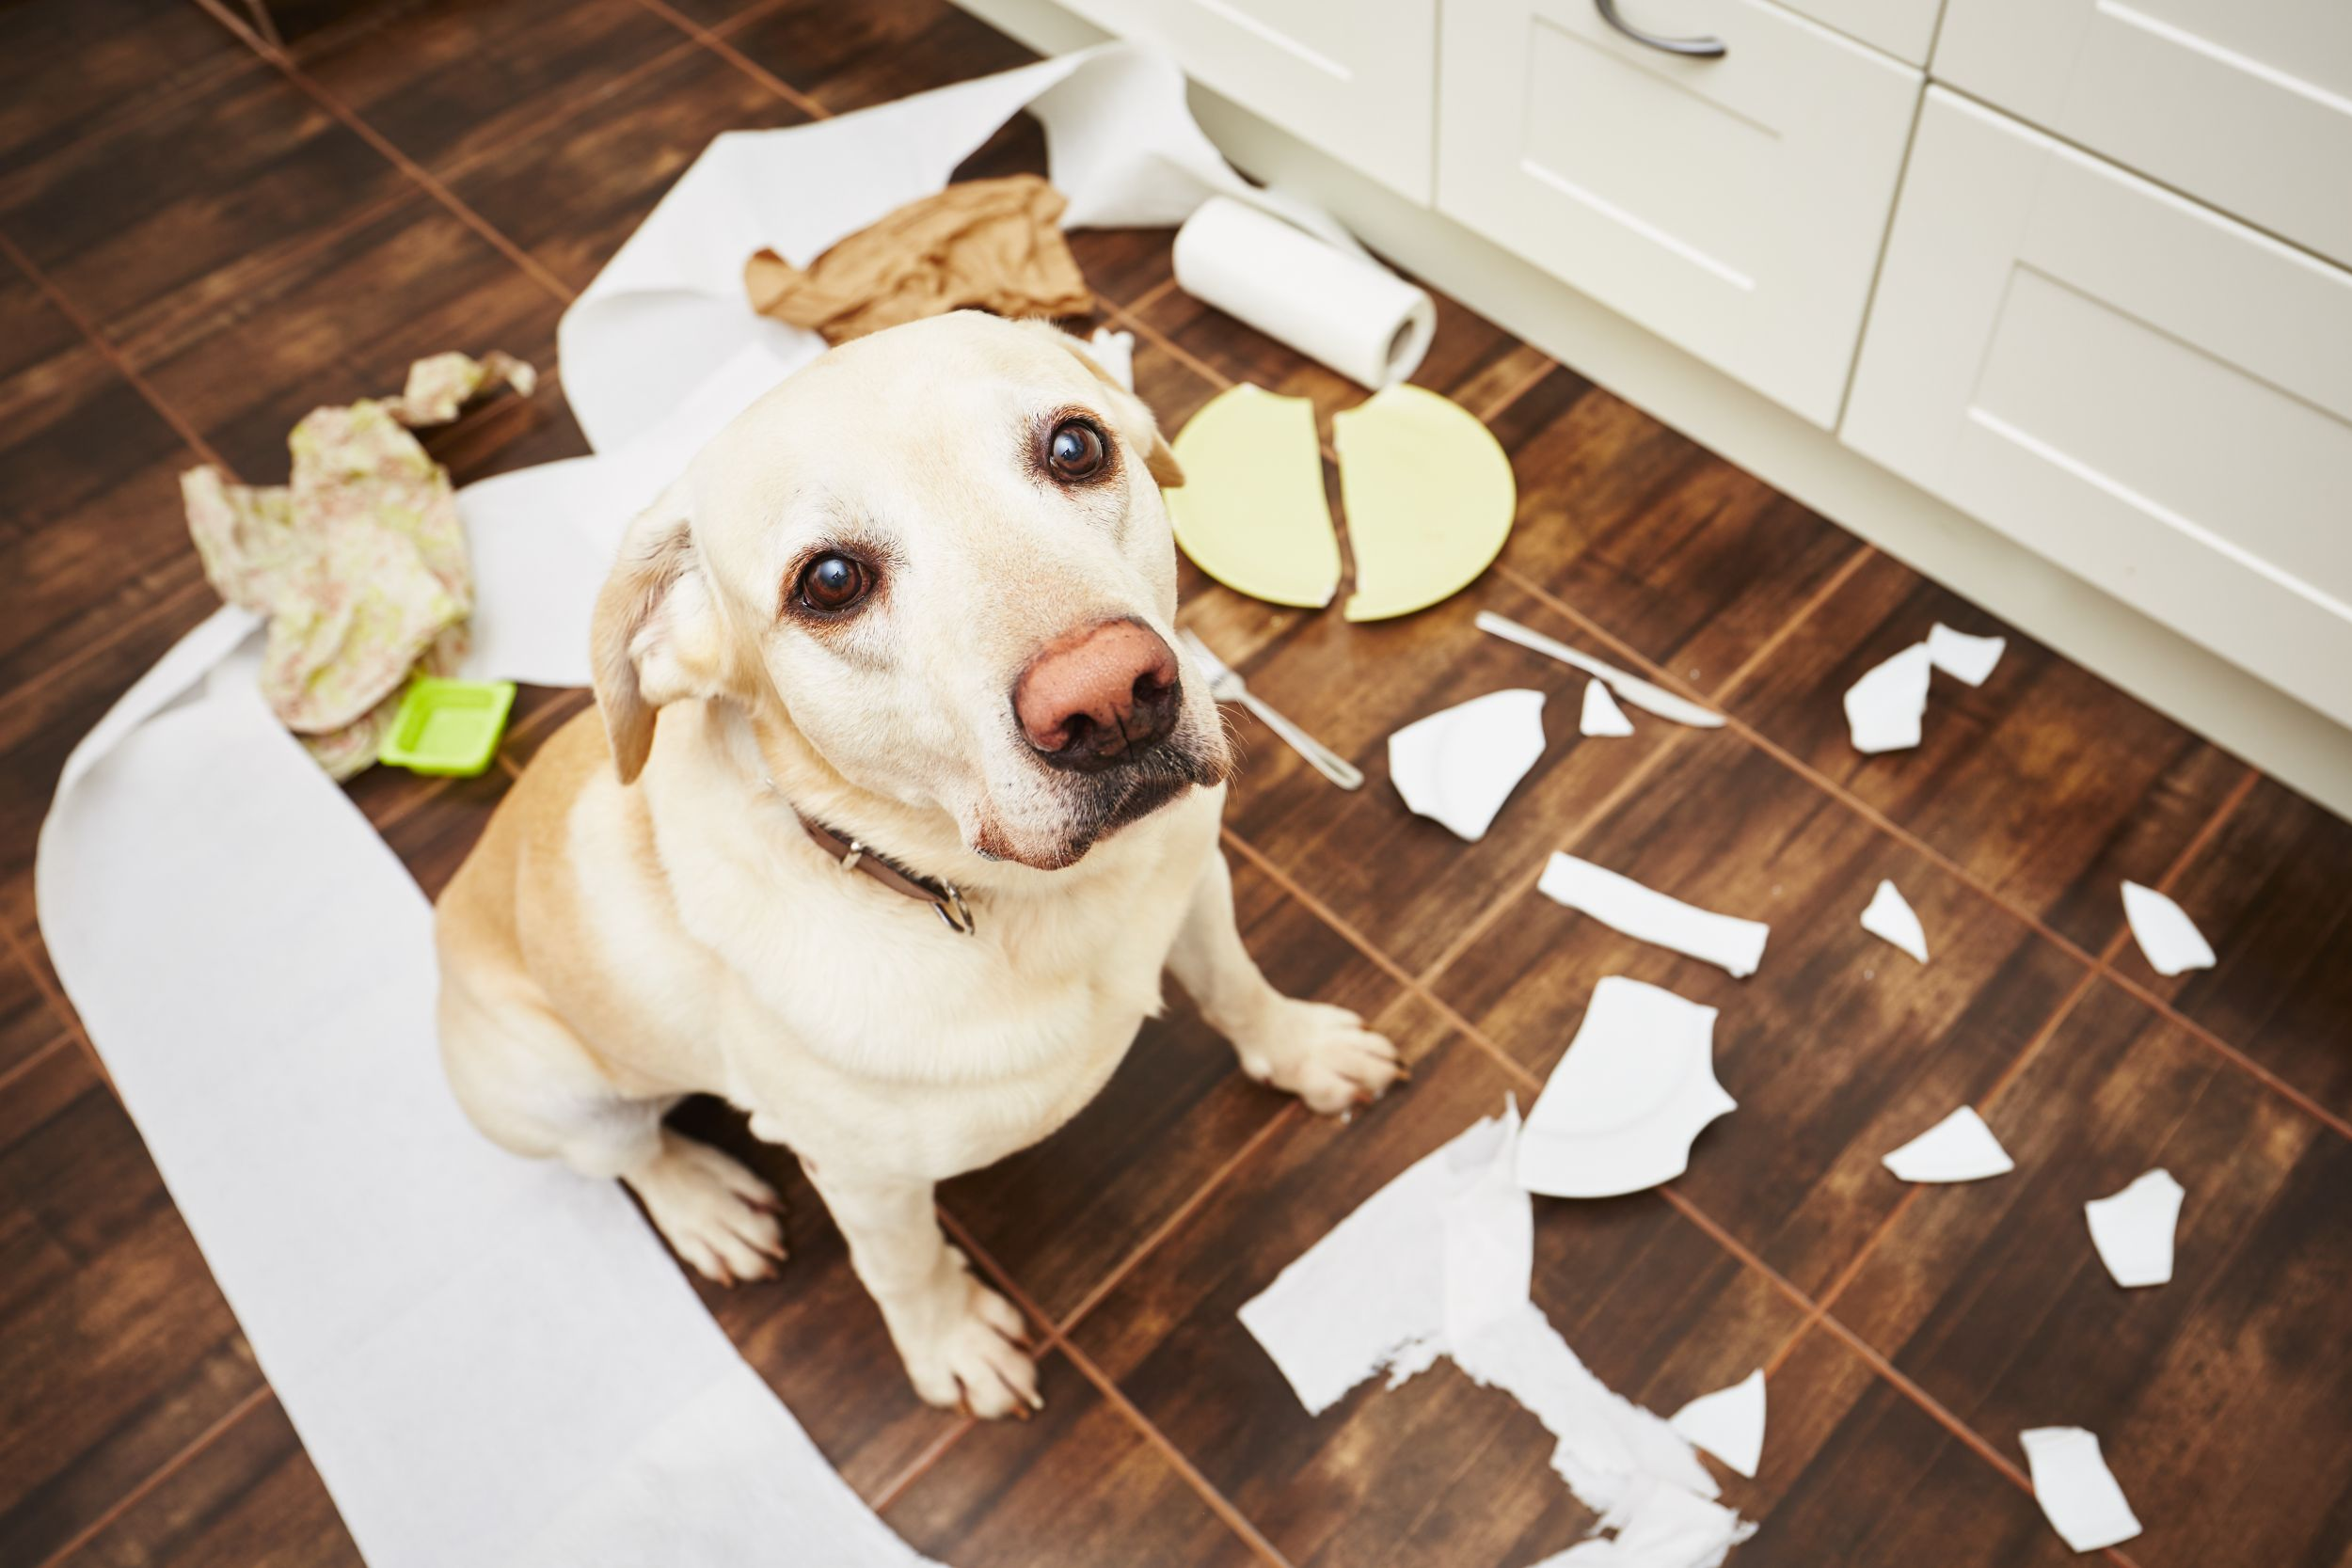 Dogilike.com :: หมากลัวกรง เกิดจากอะไร จะแก้ยังไงดี